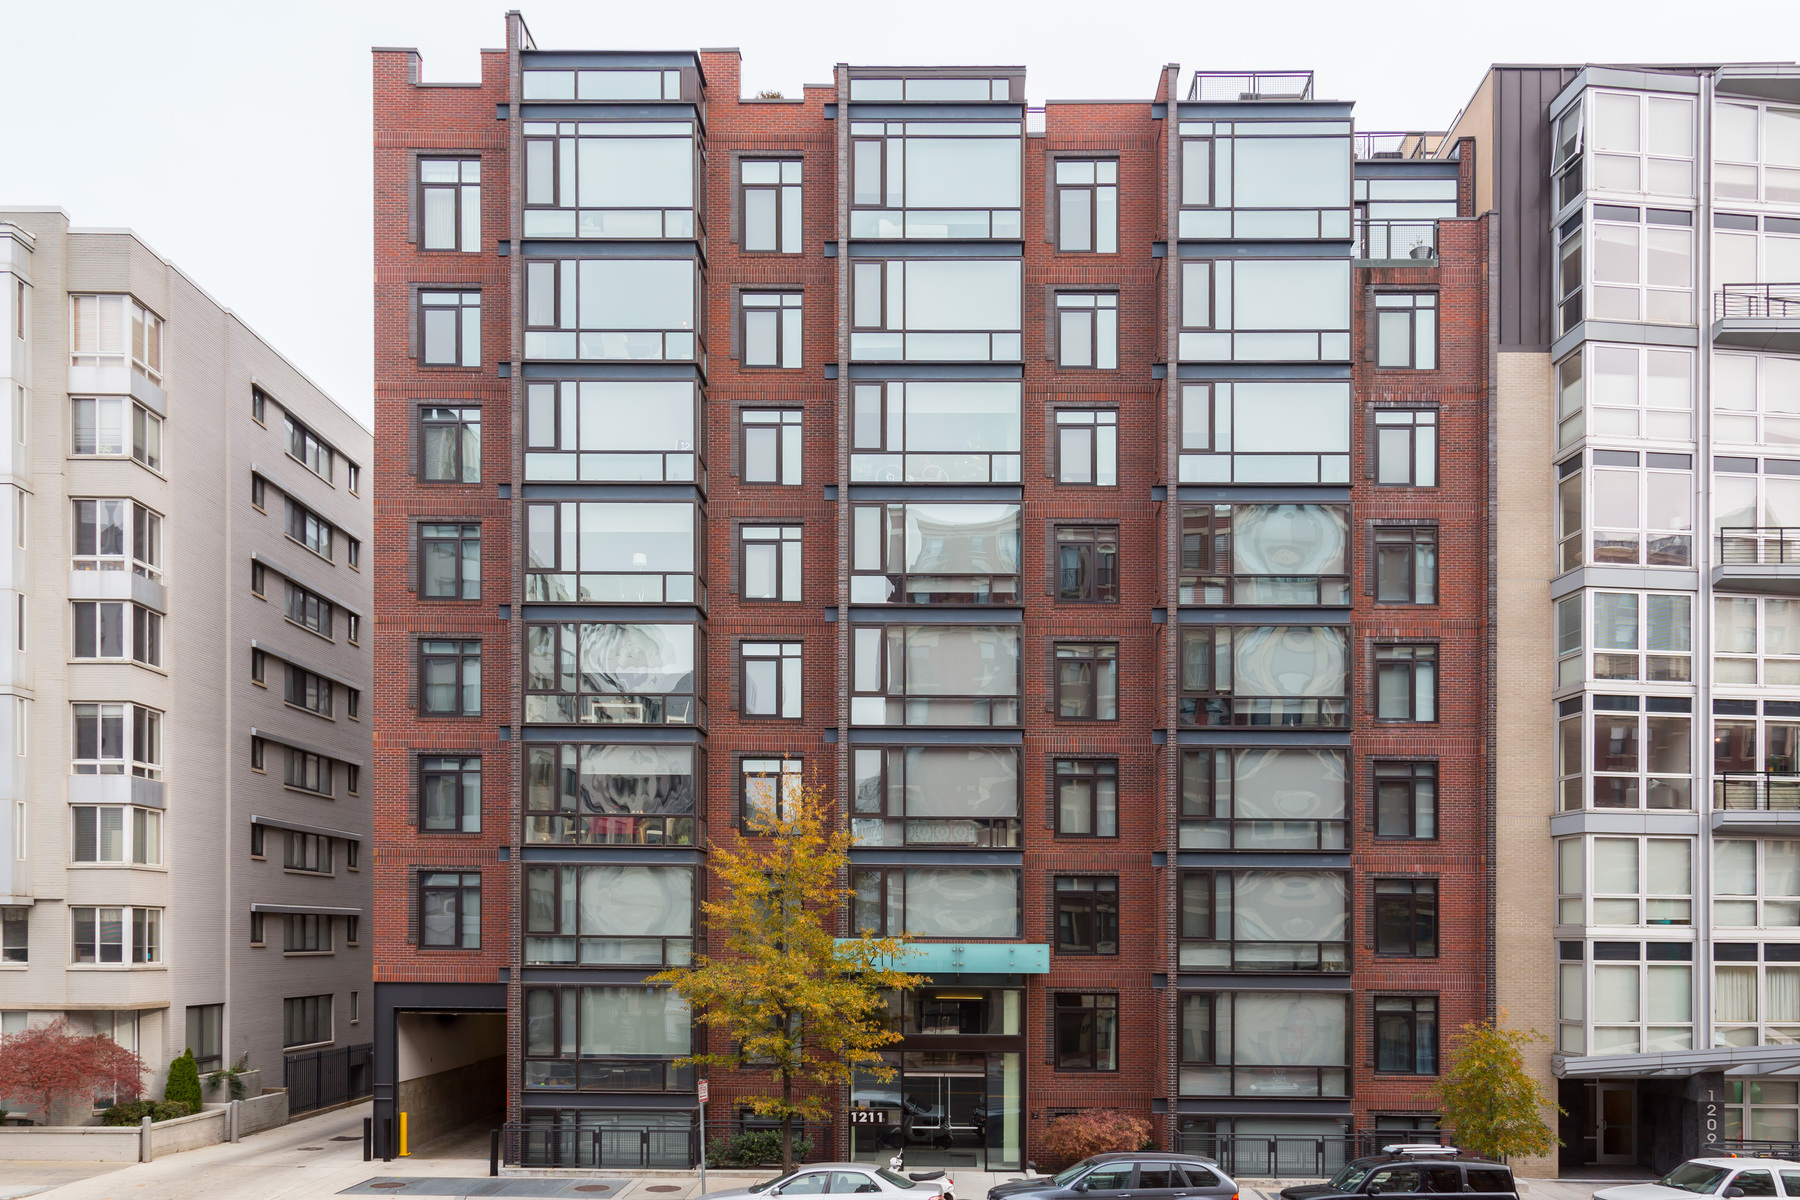 Condominium for Sale at 1211 13th Street Nw 703, Washington Washington, District Of Columbia, 20005 United States